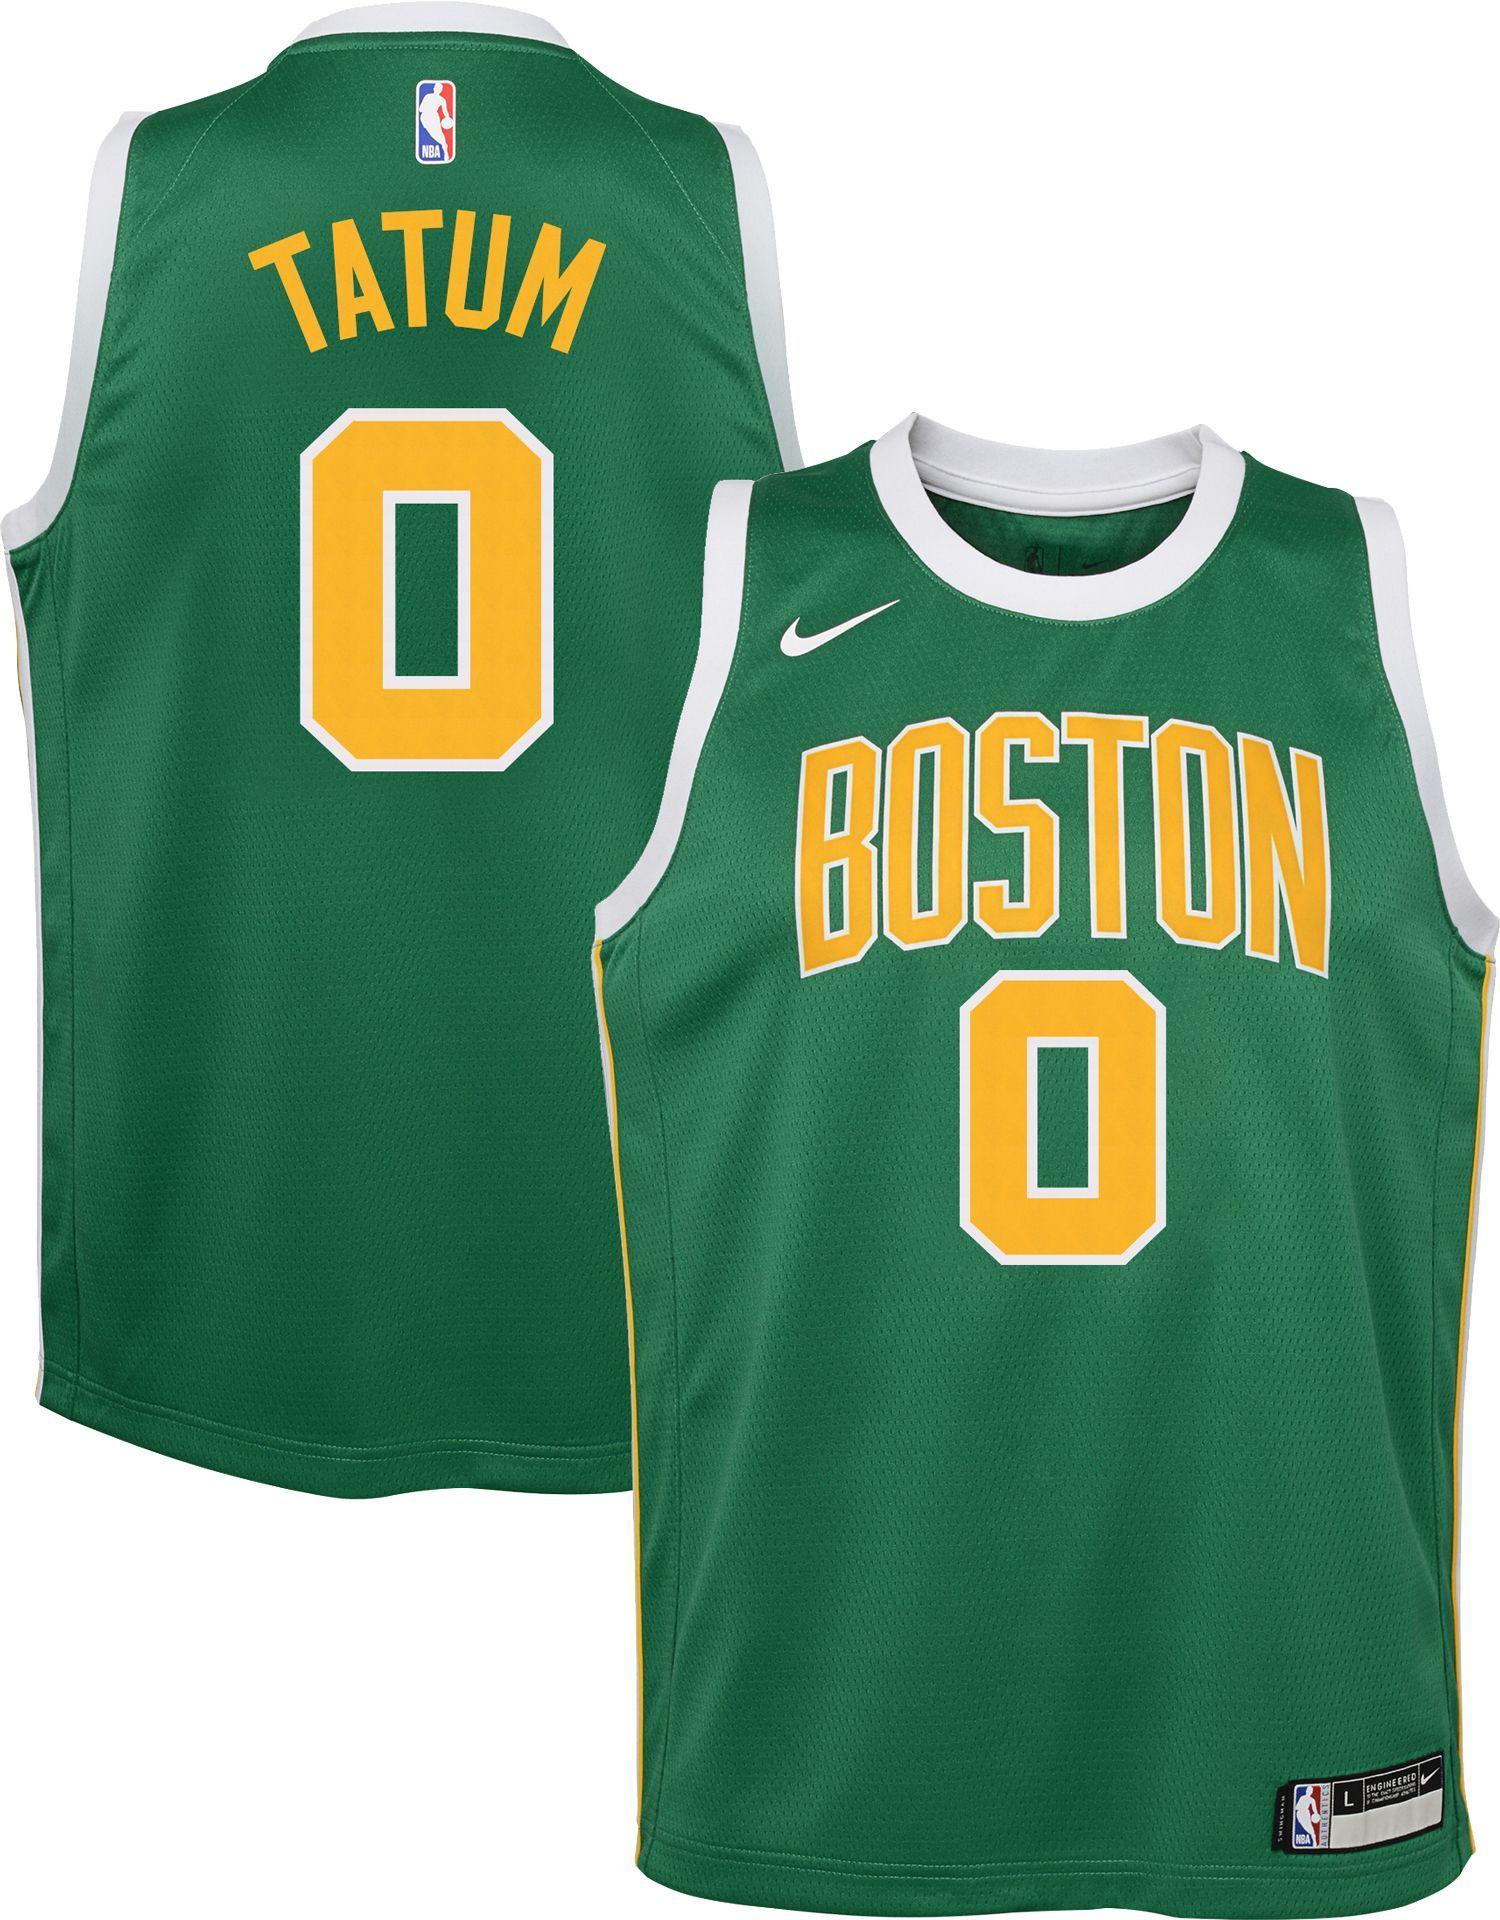 finest selection 0dd44 52f2d Nike Youth Boston Celtics Jayson Tatum Dri-FIT Earned ...